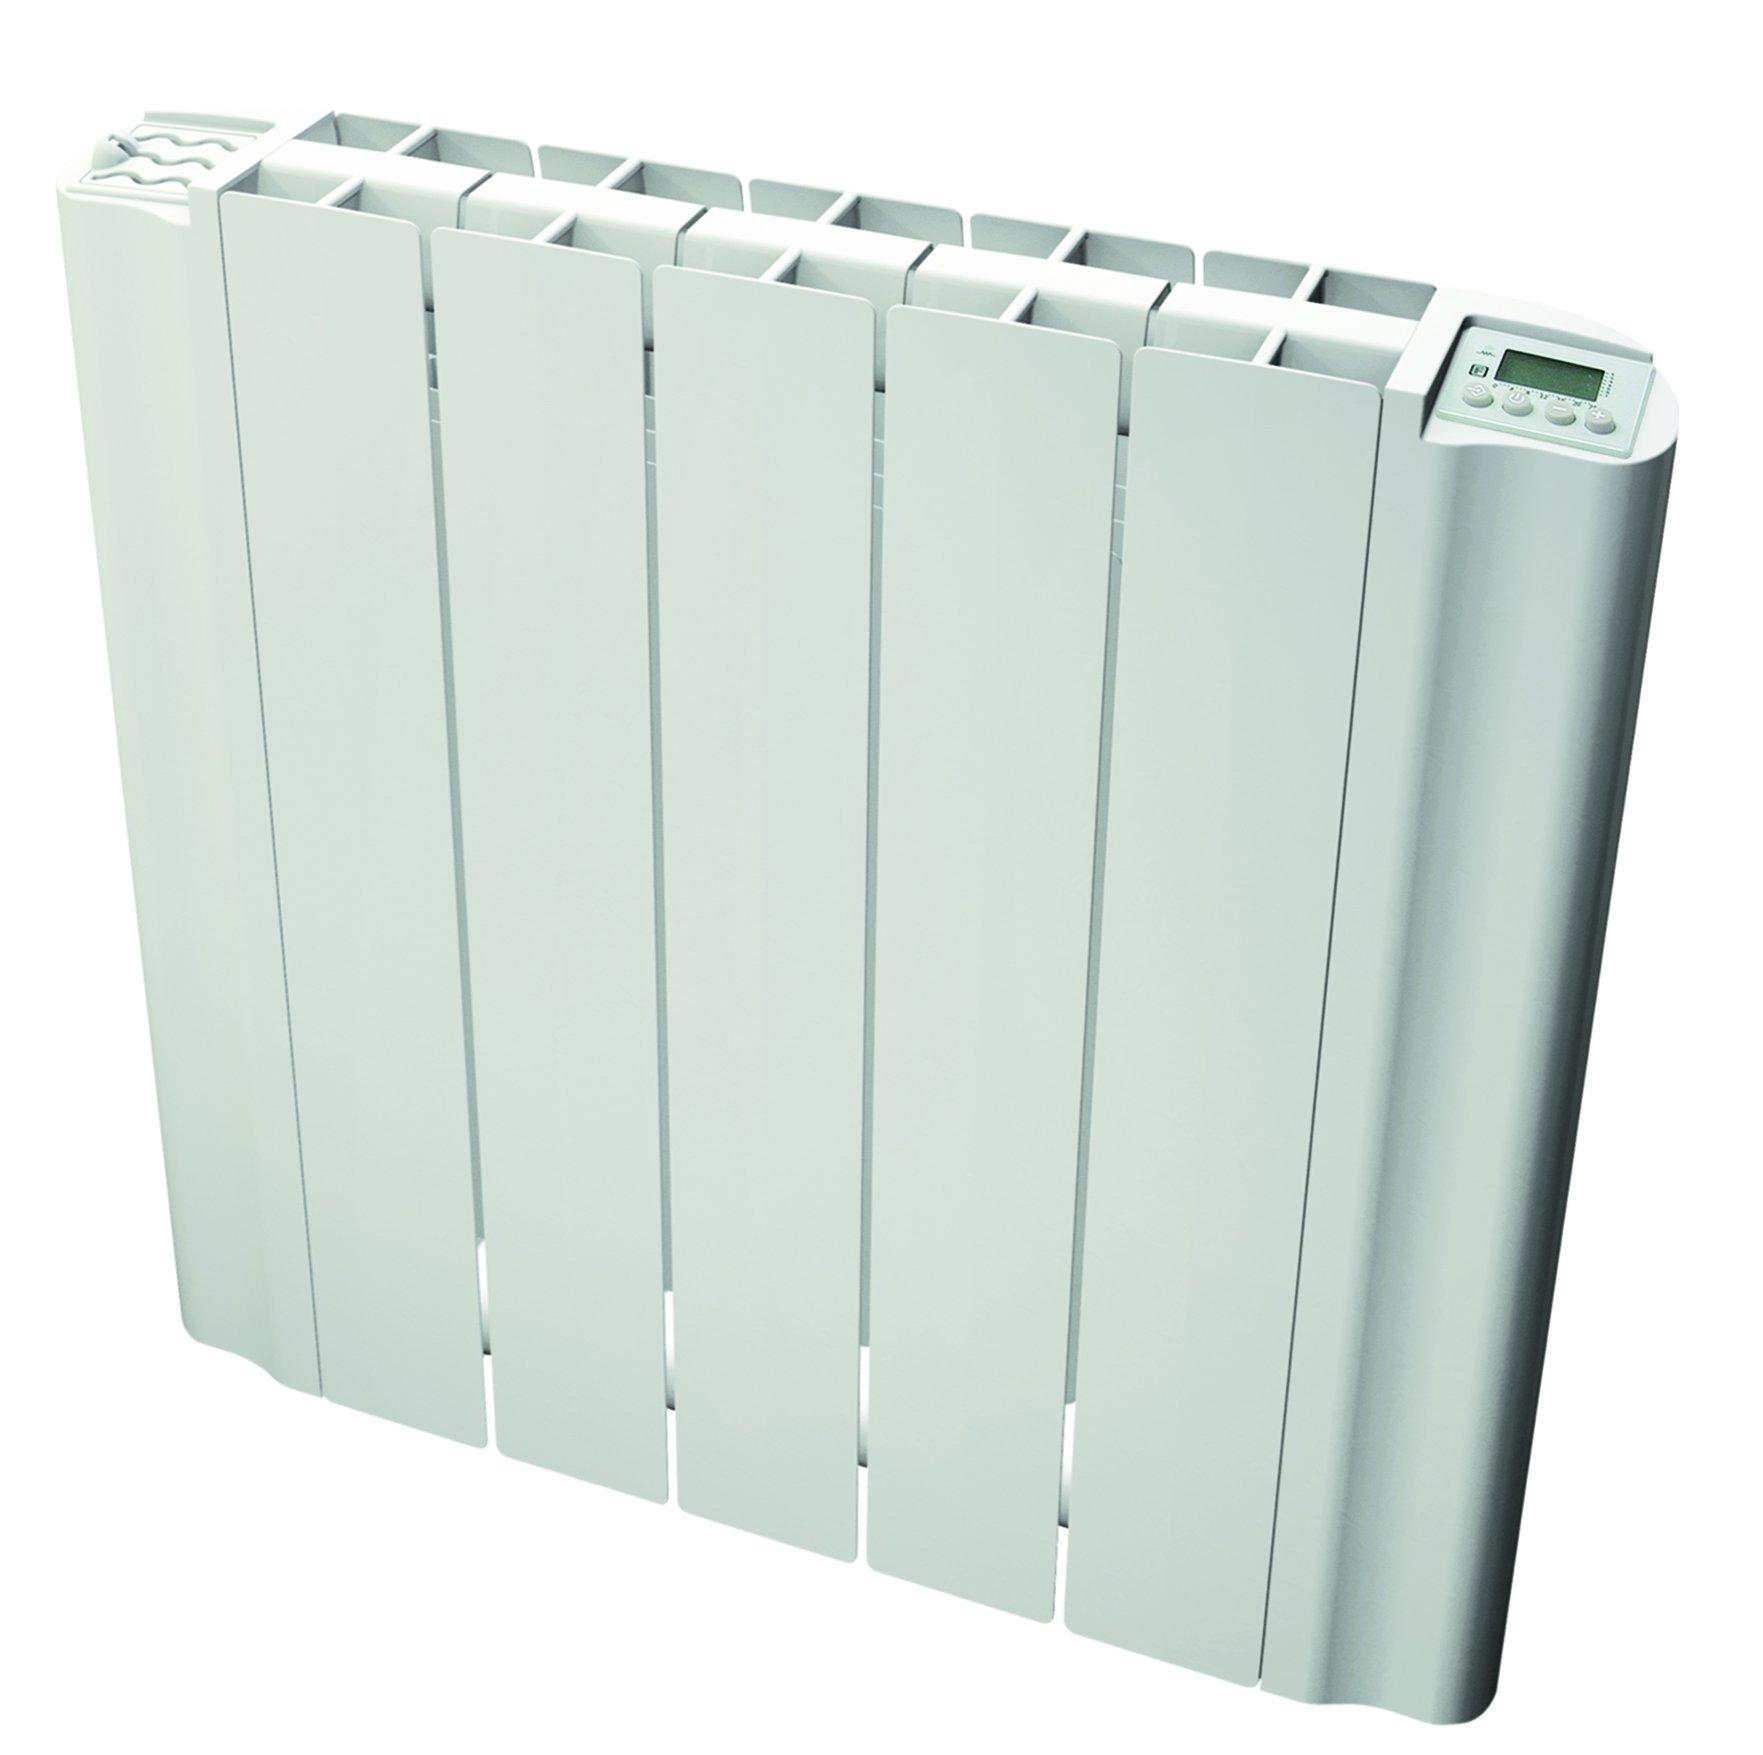 cali avanti electric heating